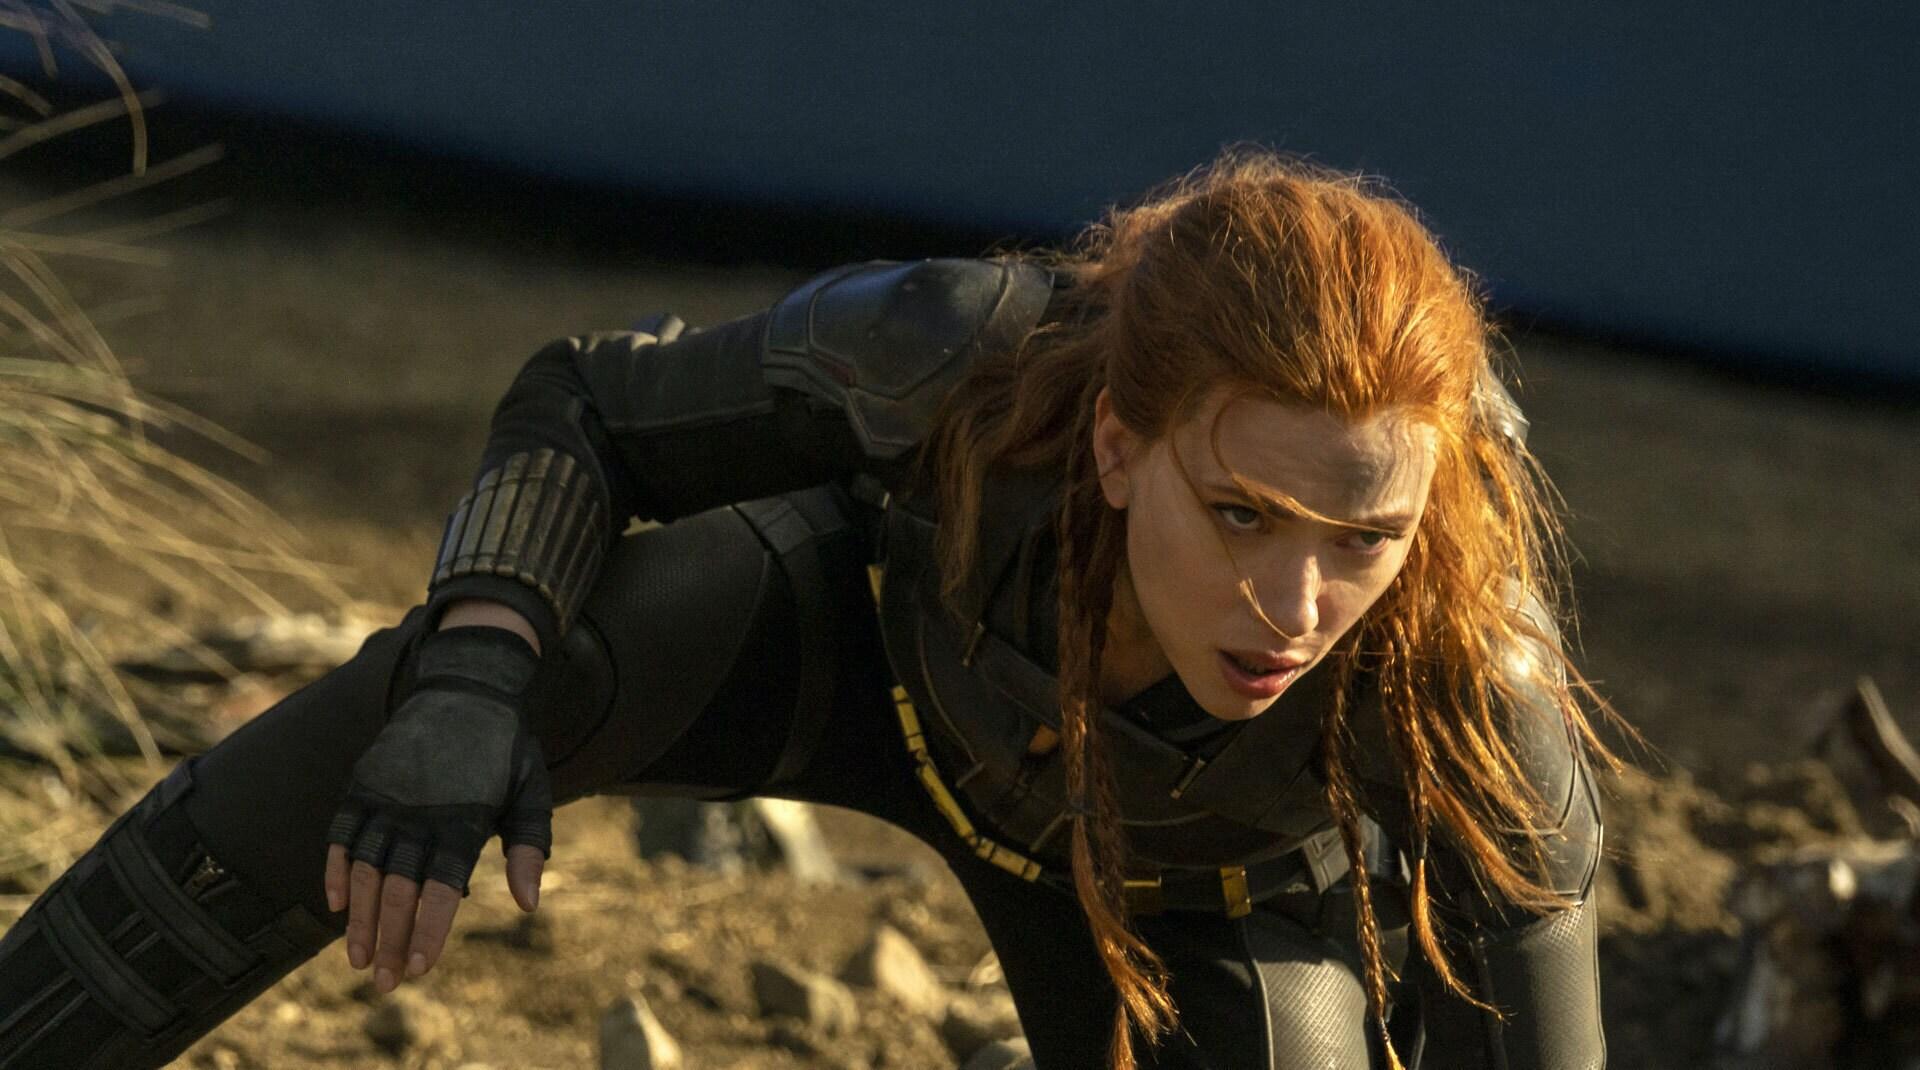 A still image from Black Widow